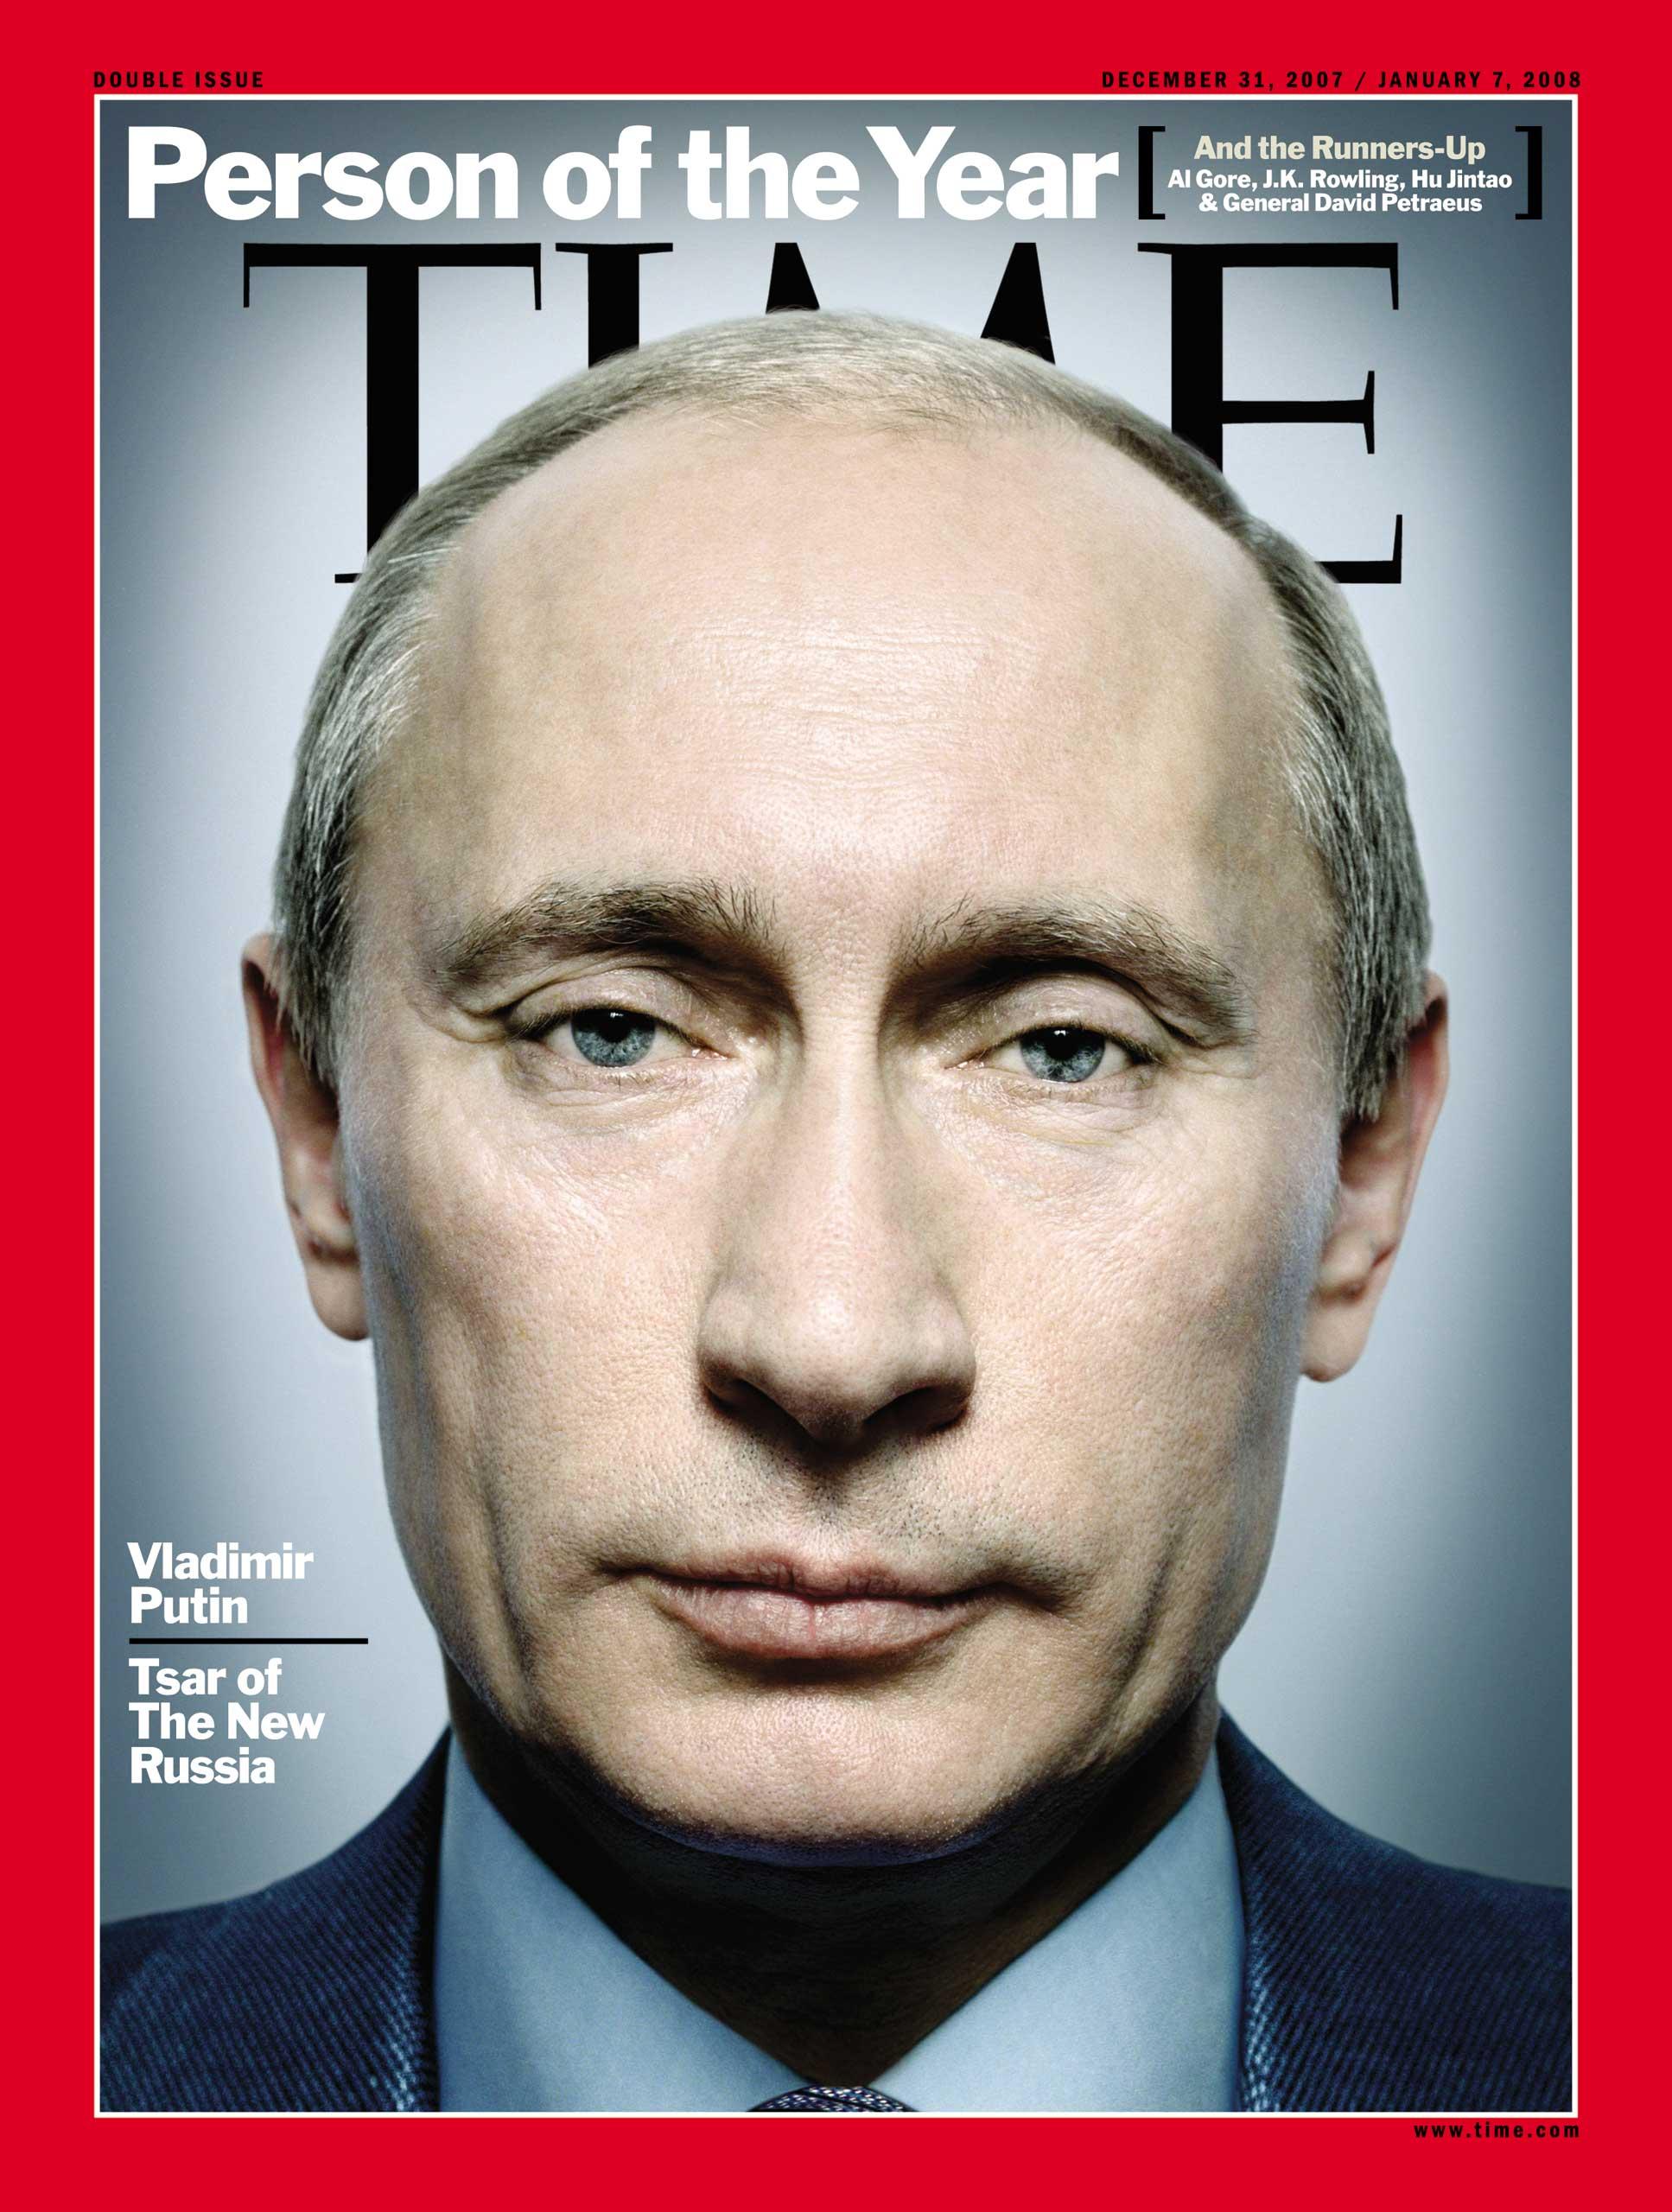 2007: Vladimir Putin